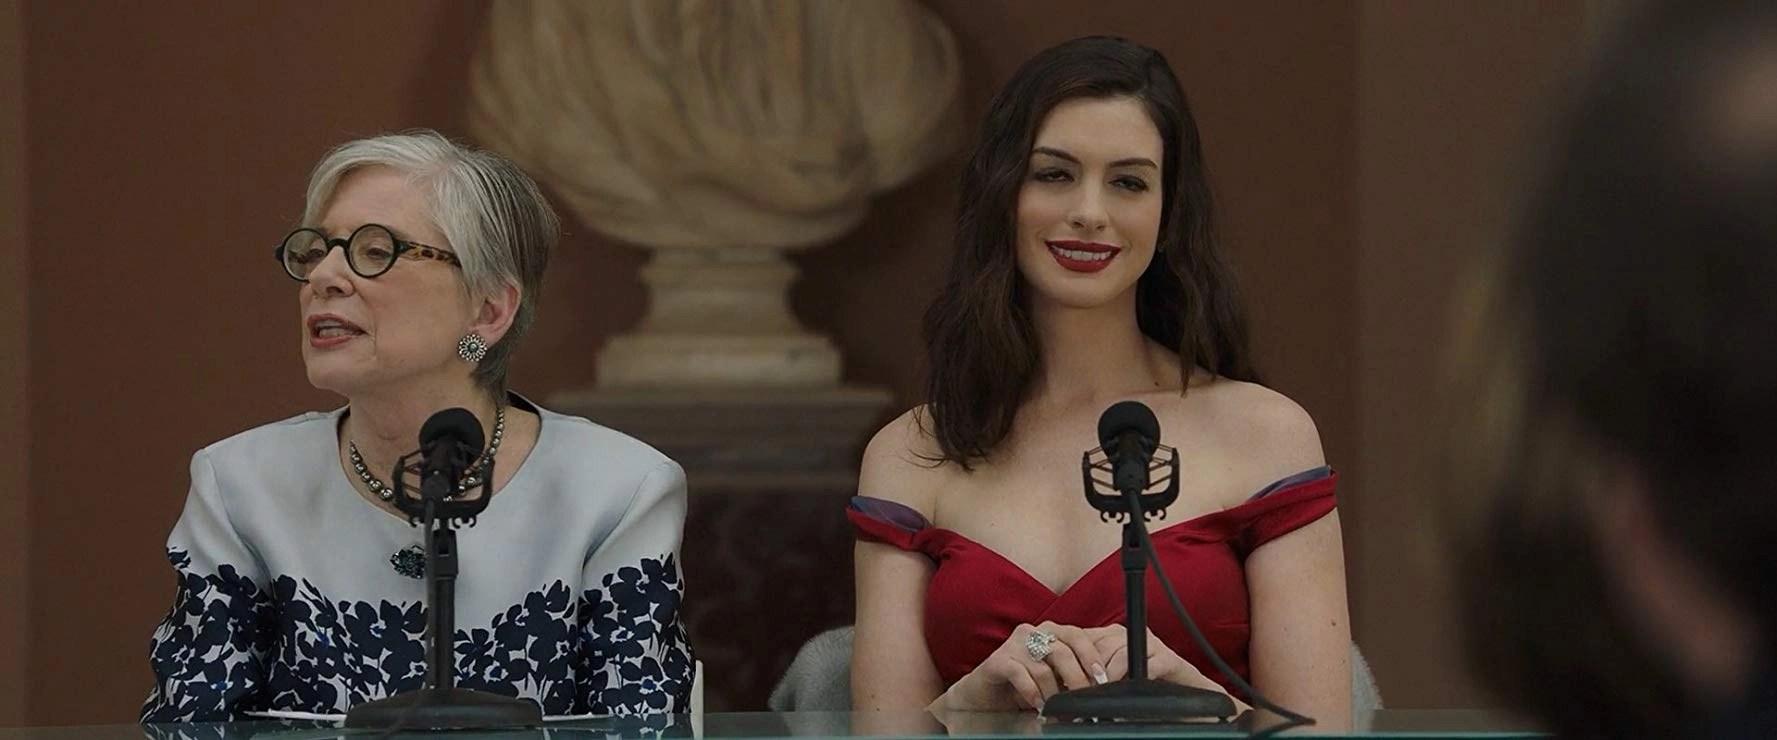 Anne Hathaway movie ocean's 8 scene